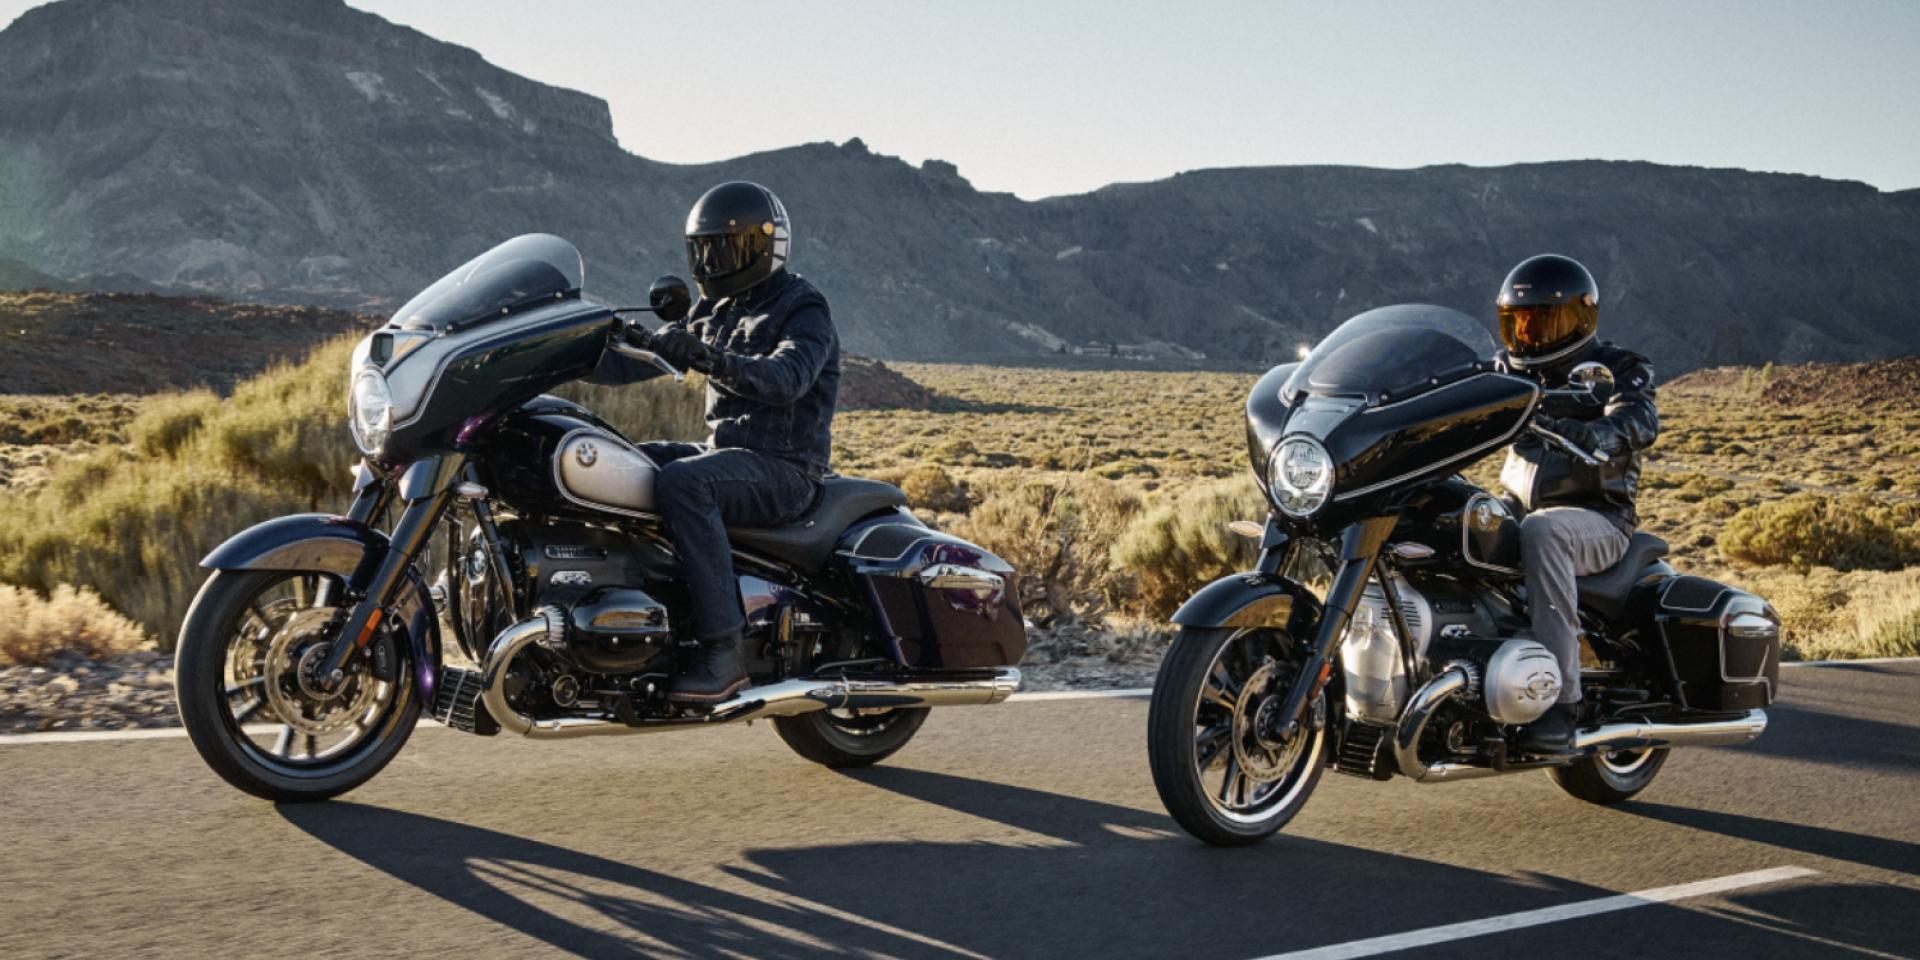 德式巨無霸。BMW Motorrad R18 Bagger/Transcontinental 海外發表!